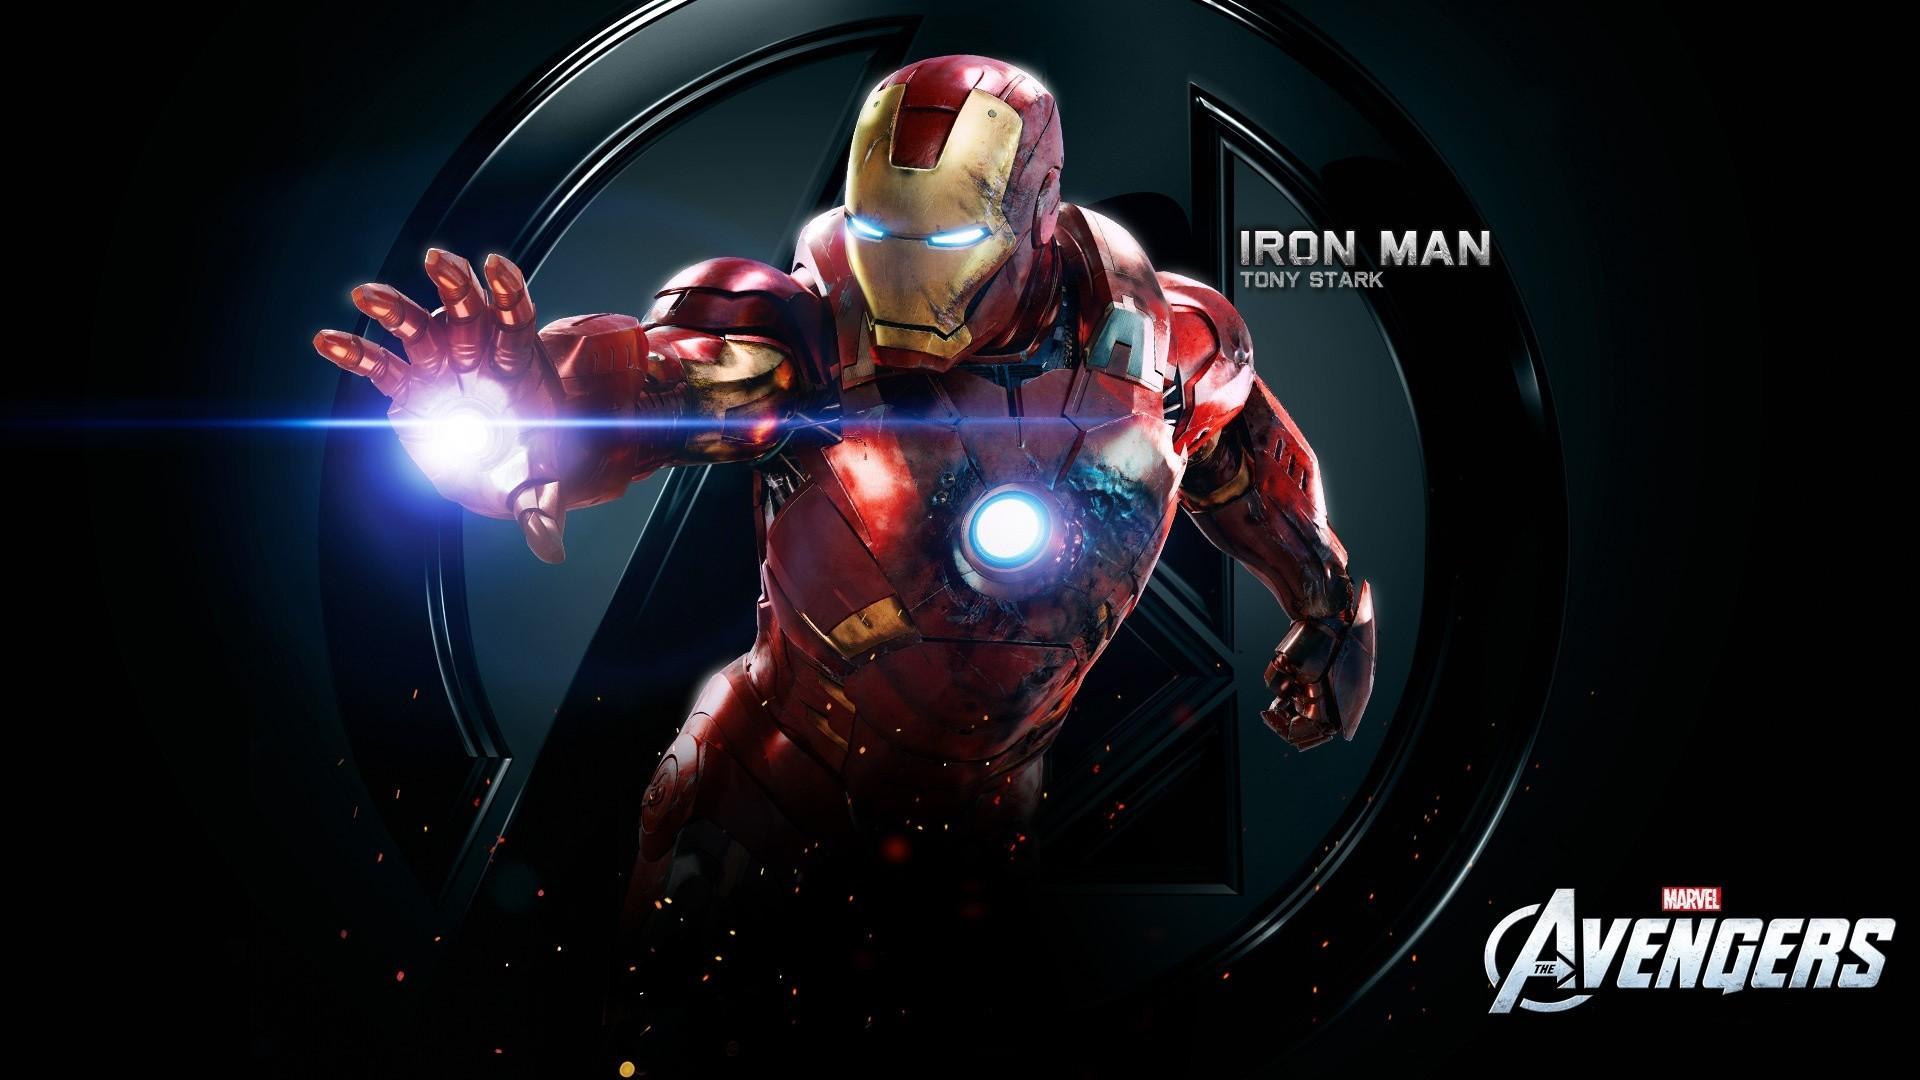 Superhero Marvel Comics Iron Man The Avengers Cinematic Universe Screenshot Computer Wallpaper